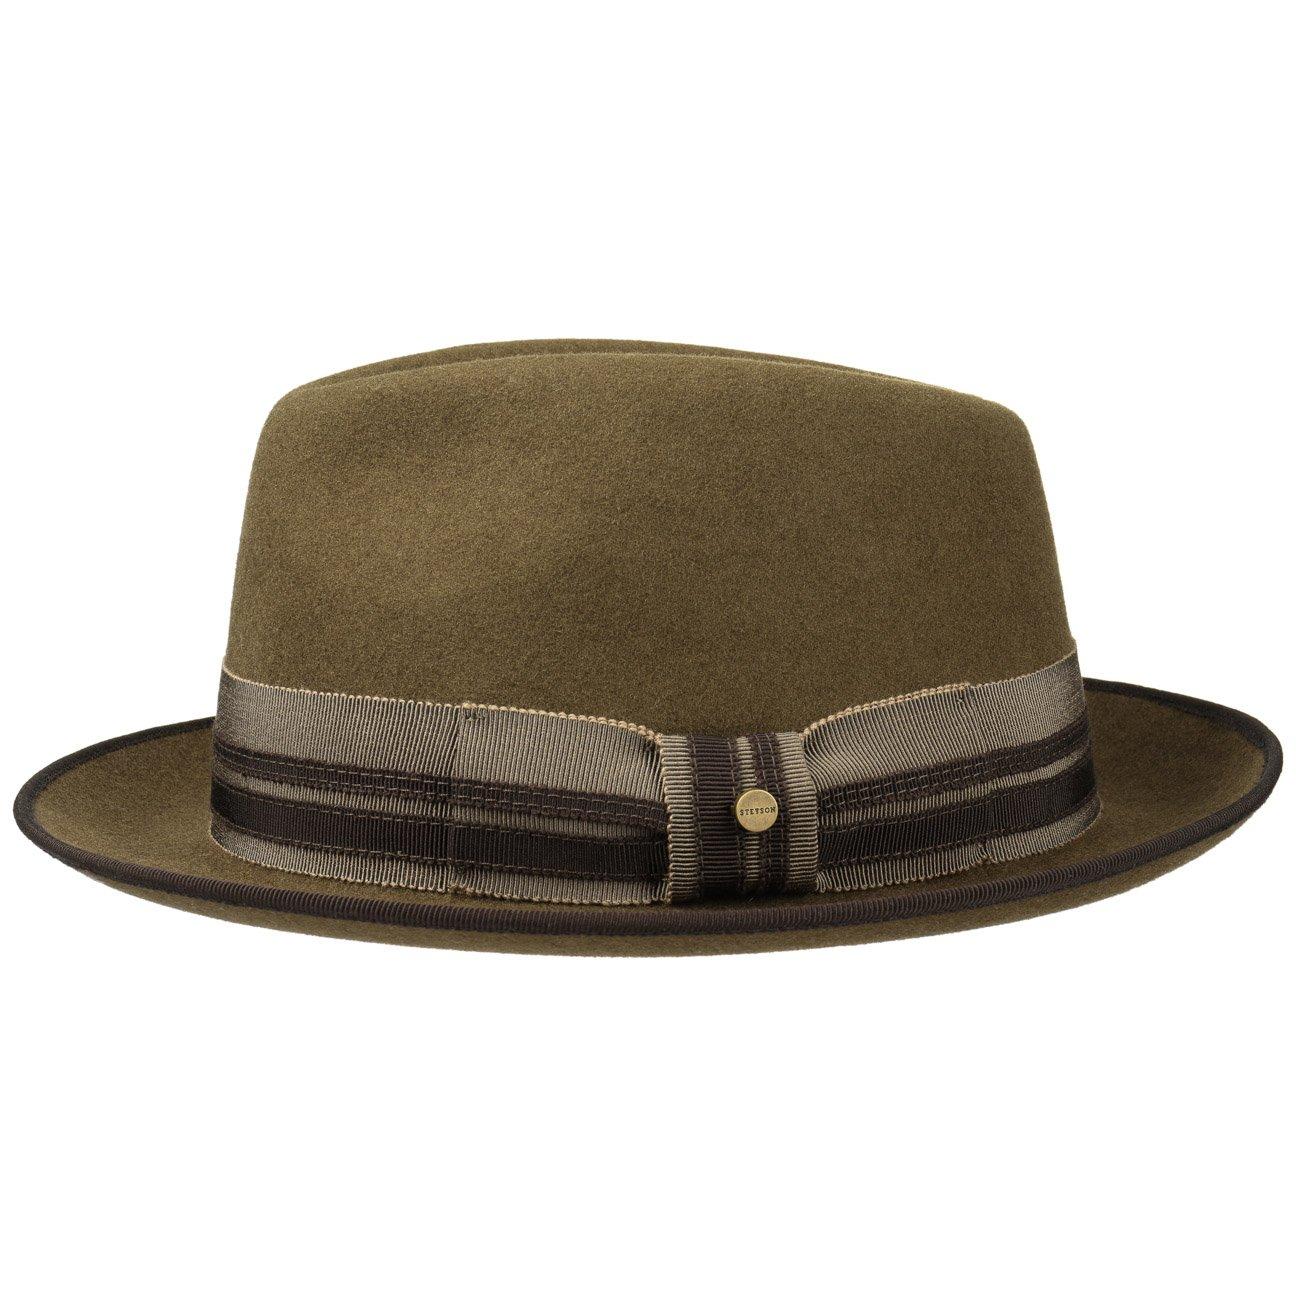 573dea0778638 Stetson Pulasco Player Wool Felt Hat Men at Amazon Men s Clothing store